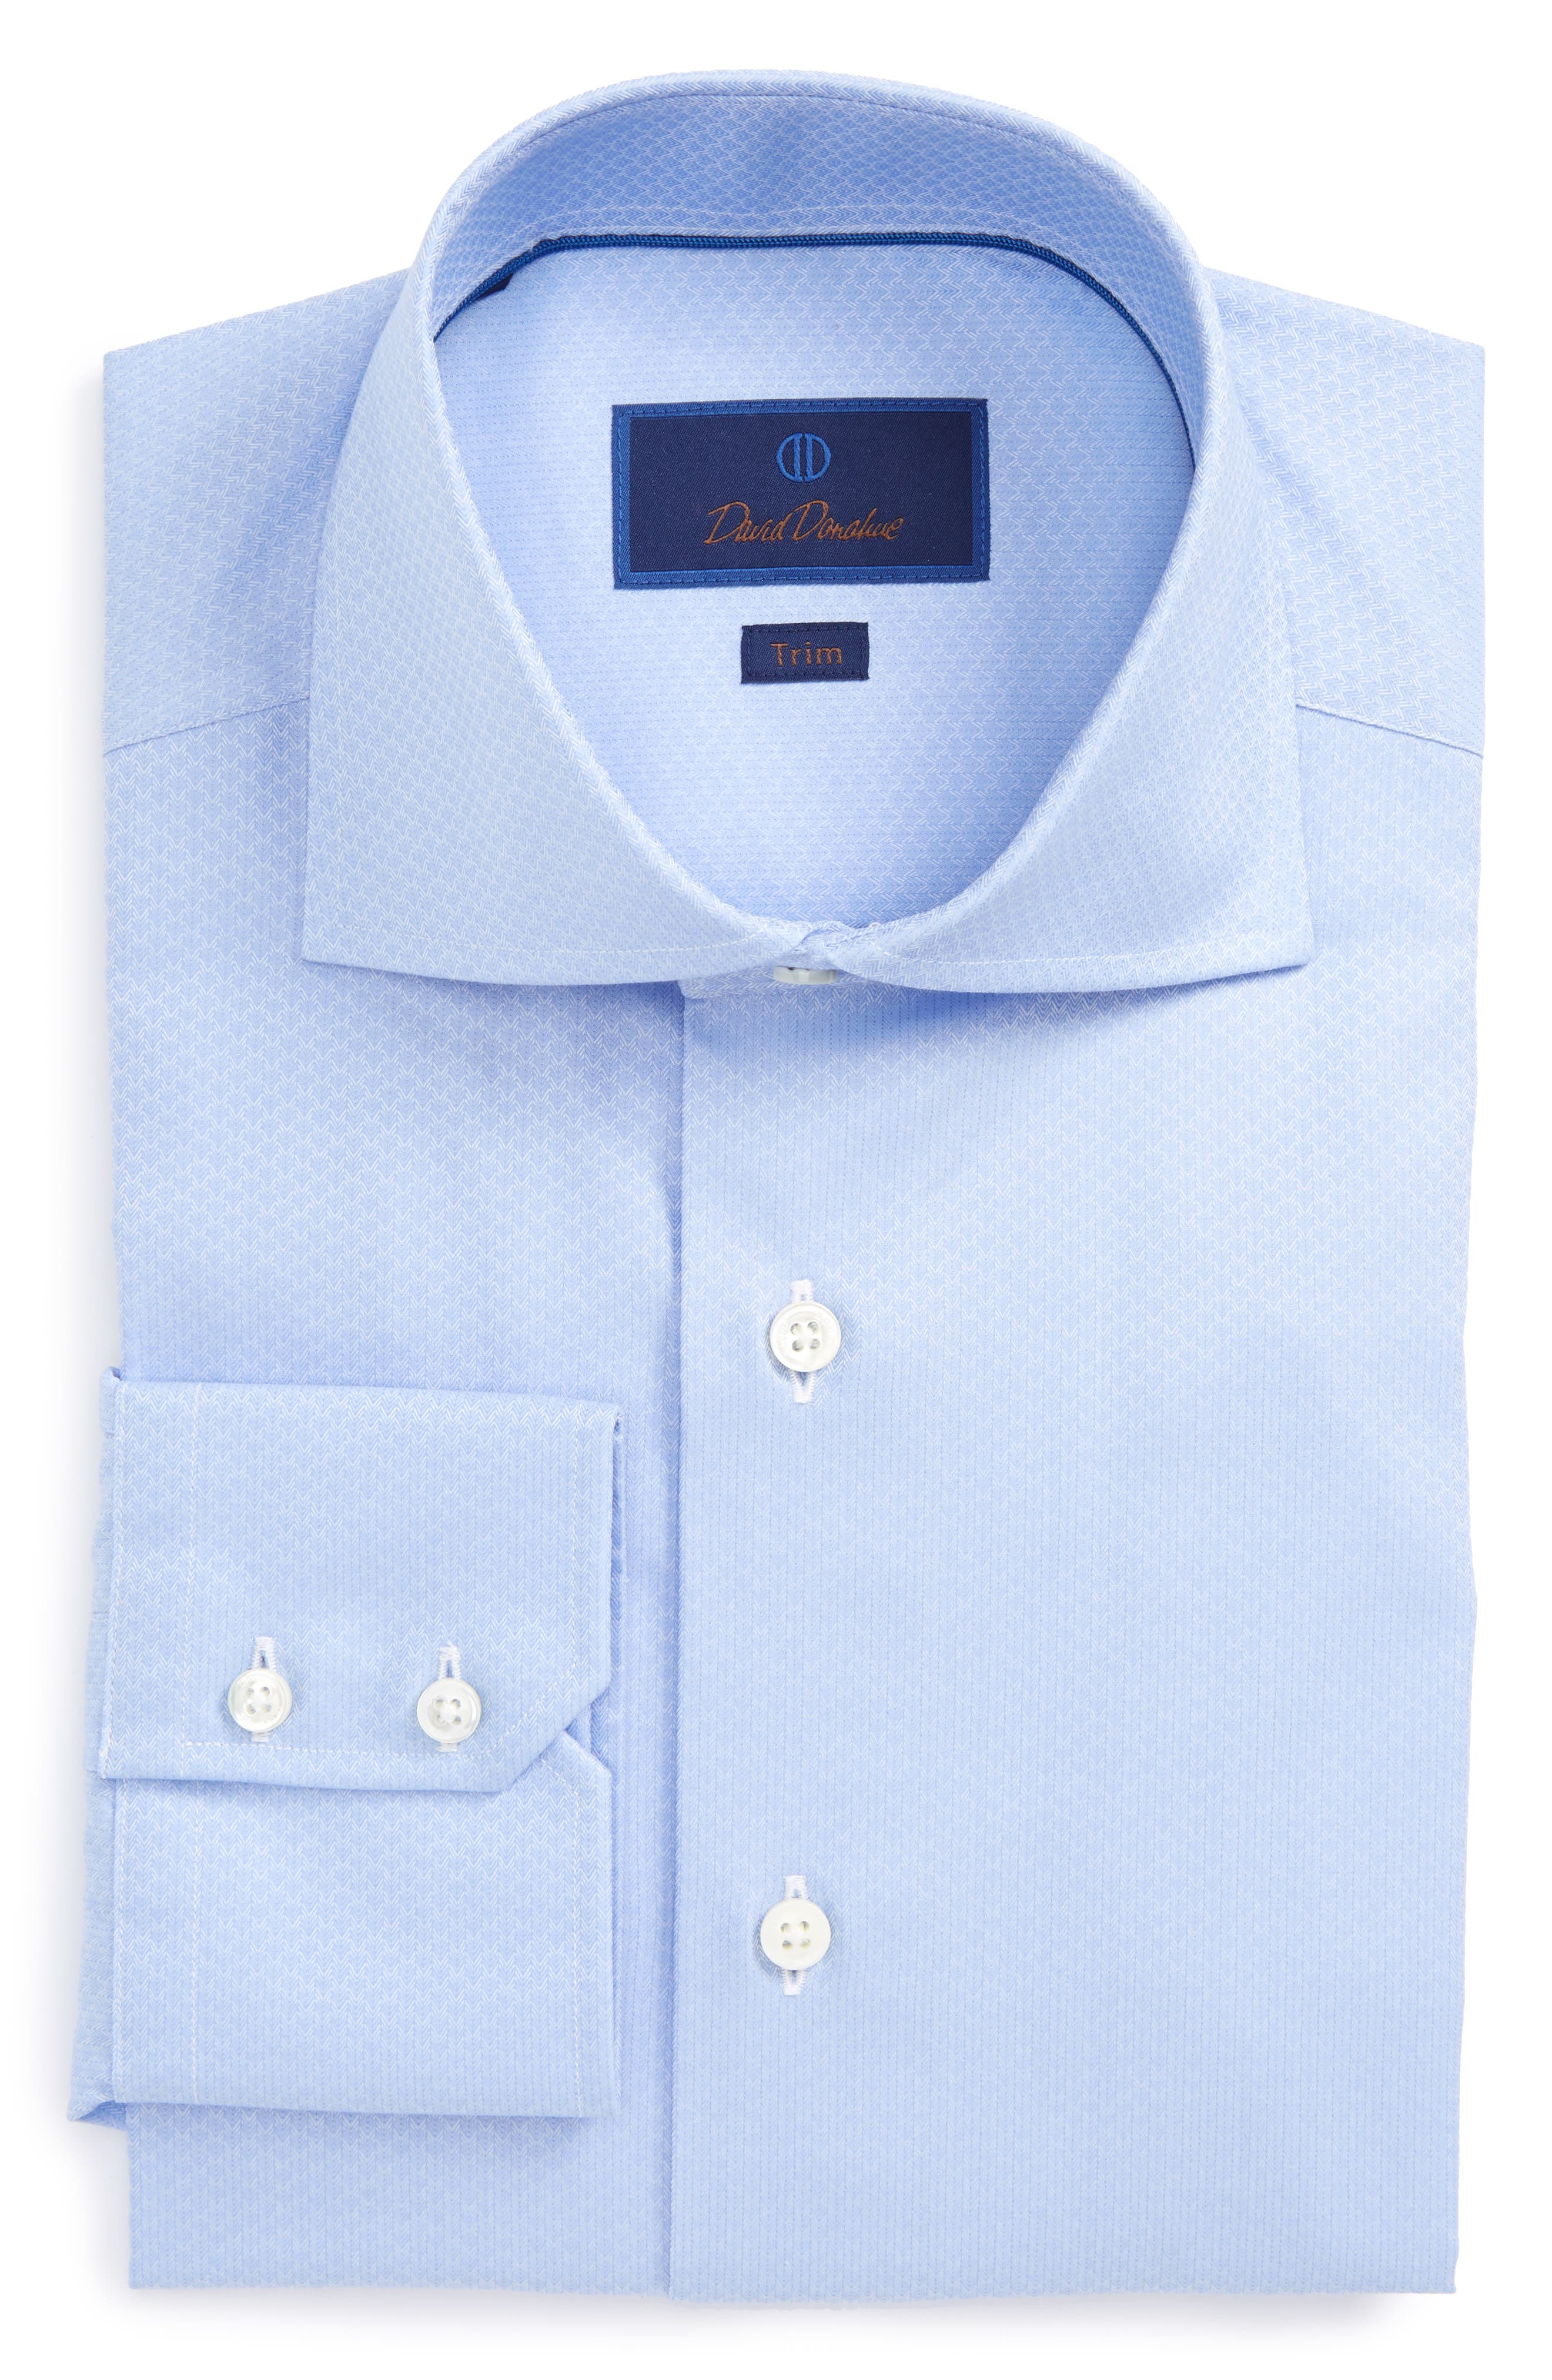 David Donahue Trim Fit Herringbone Weave Dress Shirt